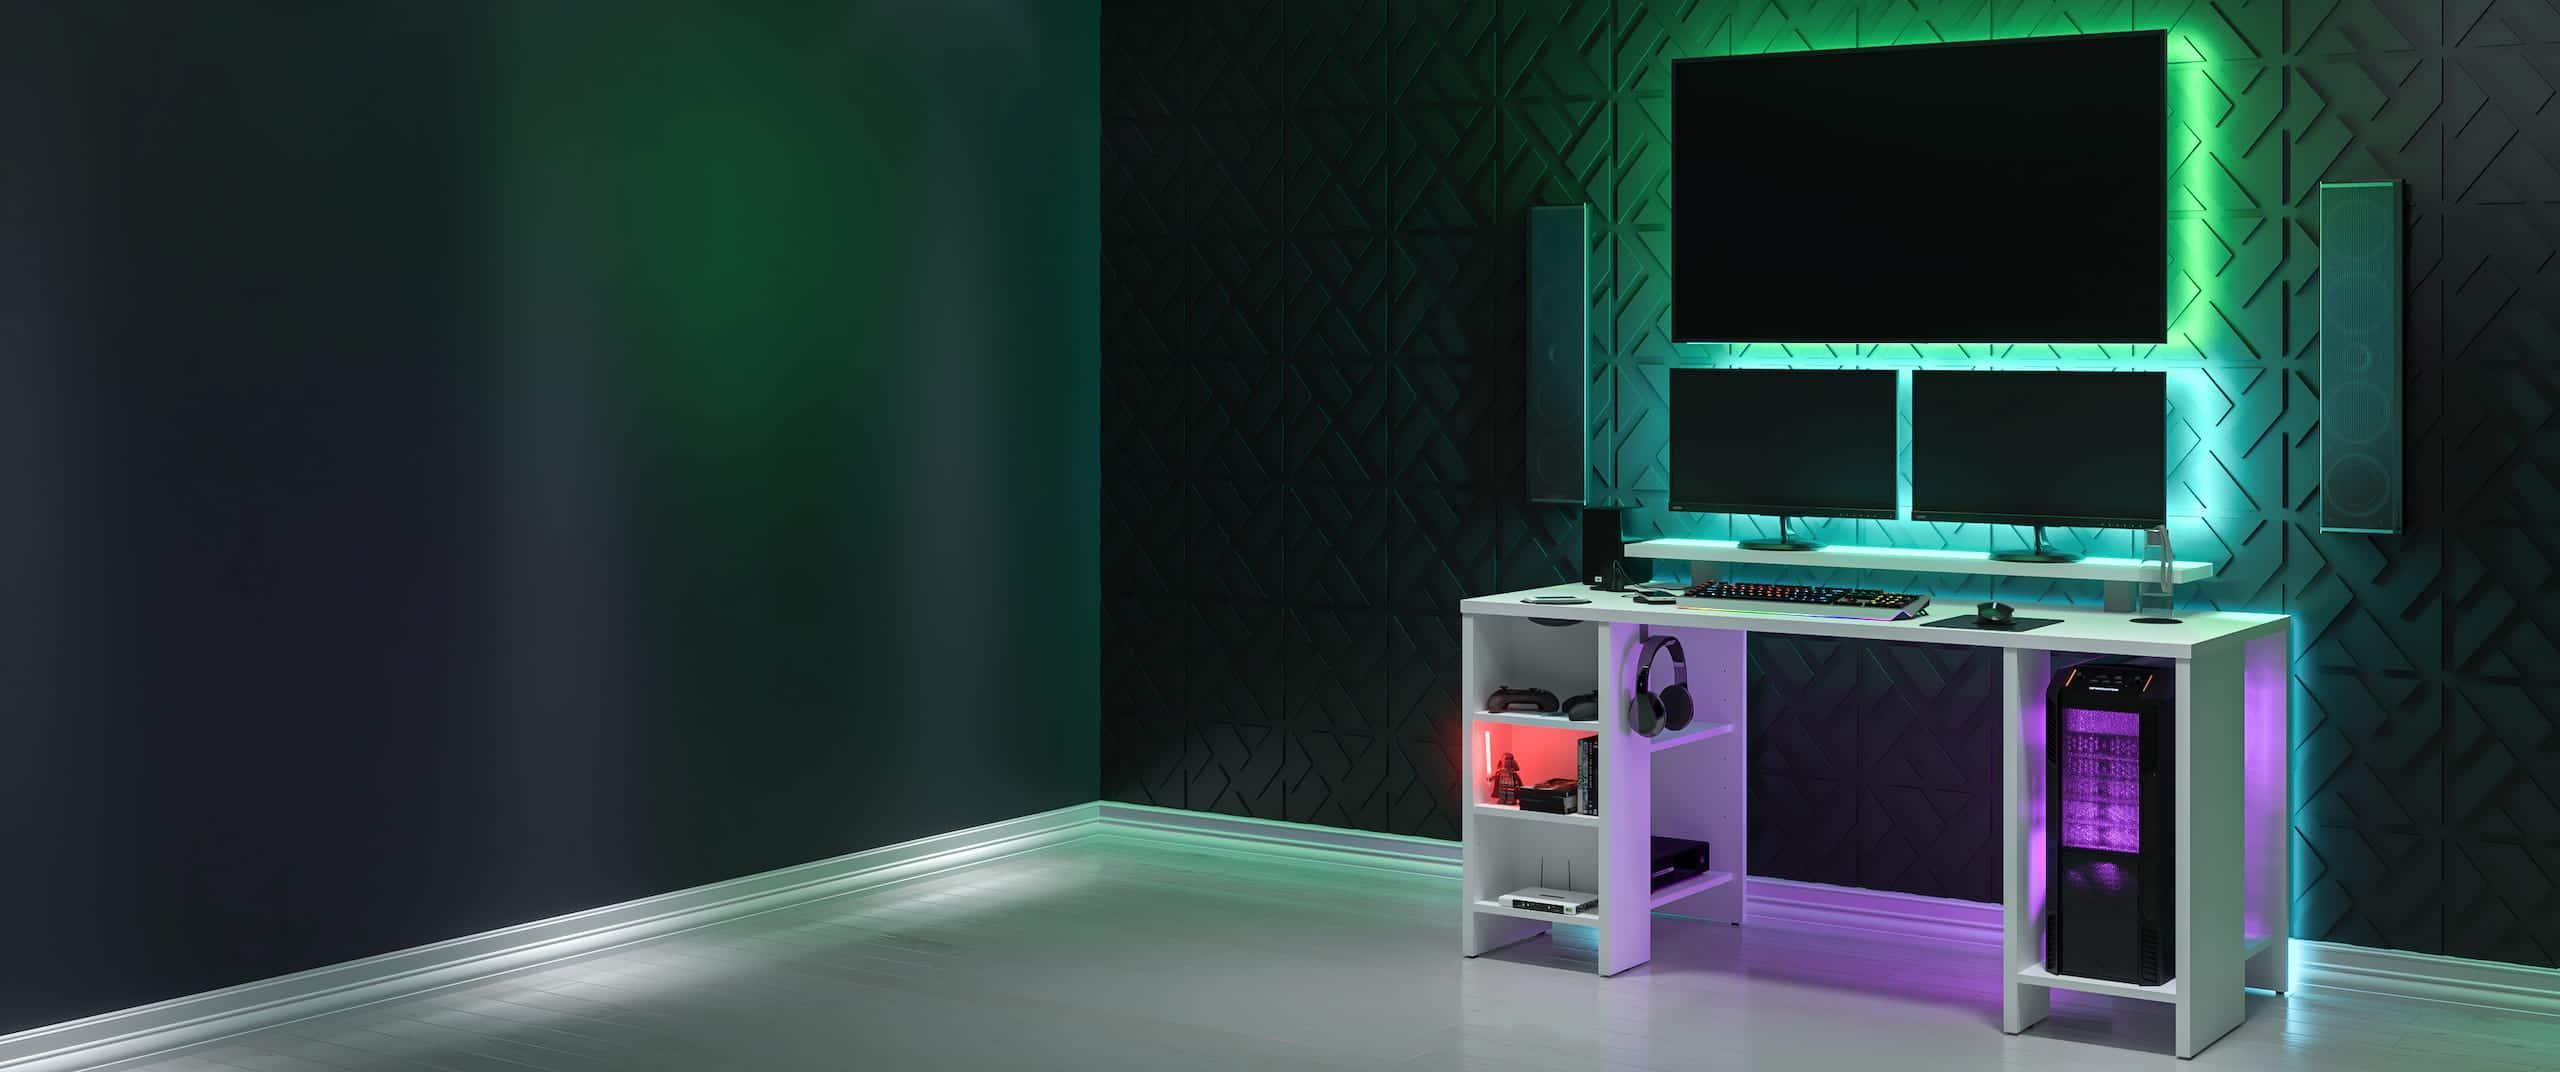 Electra Gaming Desk